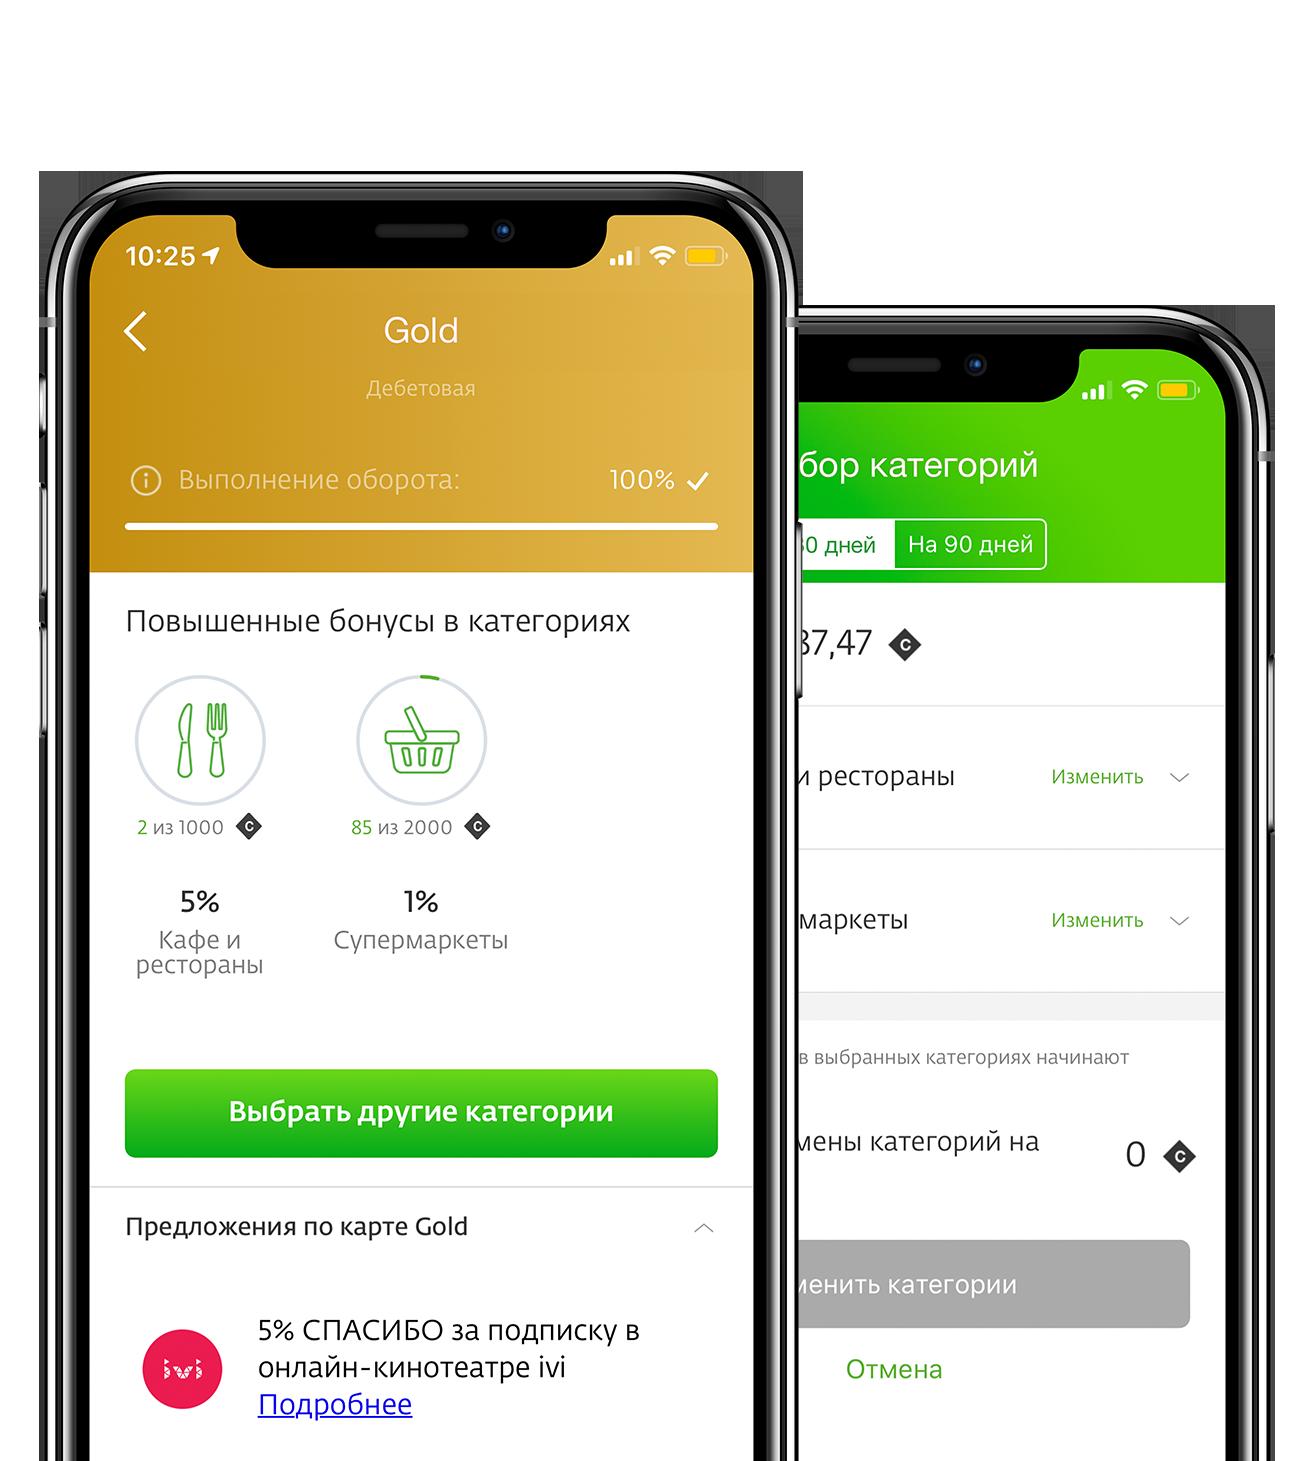 Заявка на кредитную карту в сбербанк онлайн ответ через сколько дней